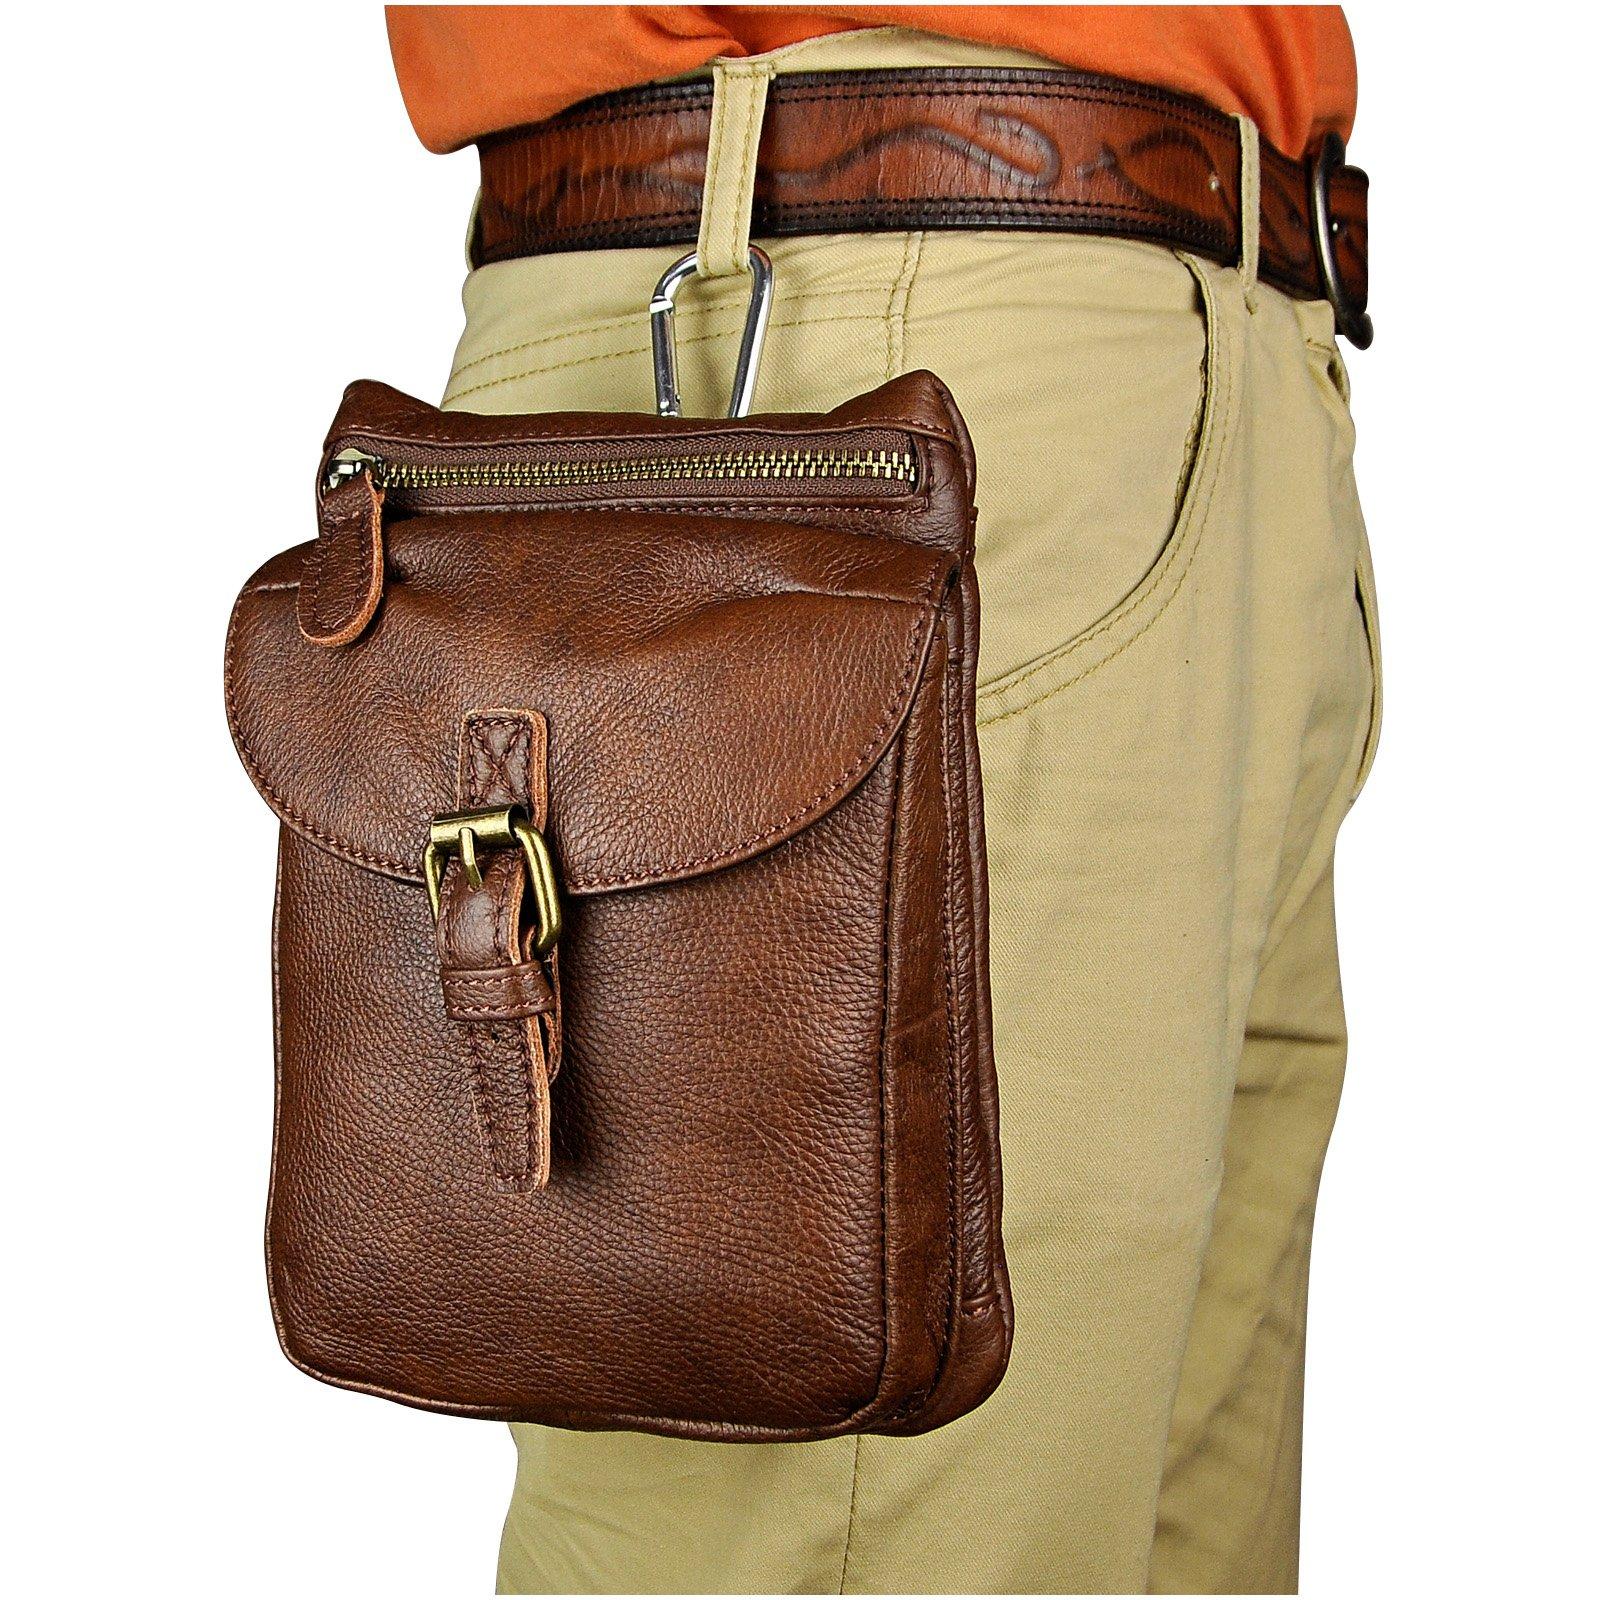 Le'aokuu Mens Genuine Leather Coffee Fanny Small Messenger Shoulder Satchel Waist Bag Pack (The 6552 brown)